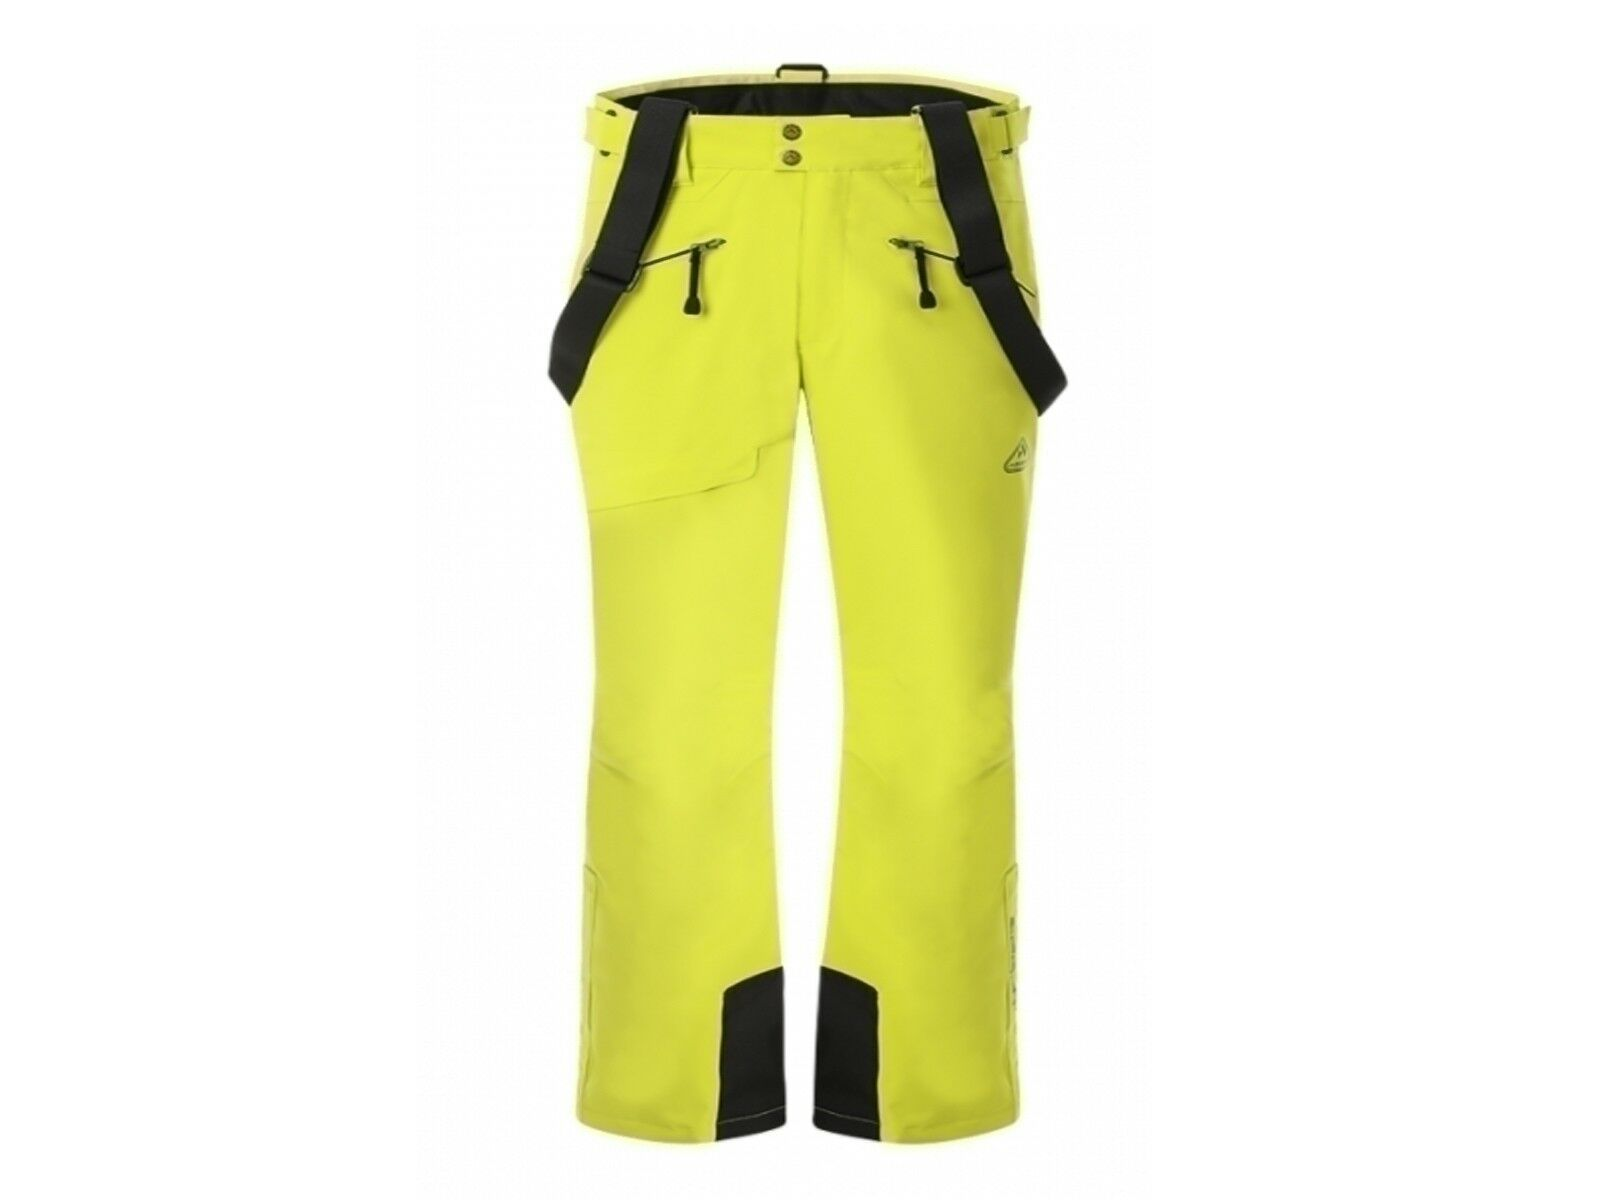 Ski trousers man Aesse 2228 0400 Cervinia Lime Grün